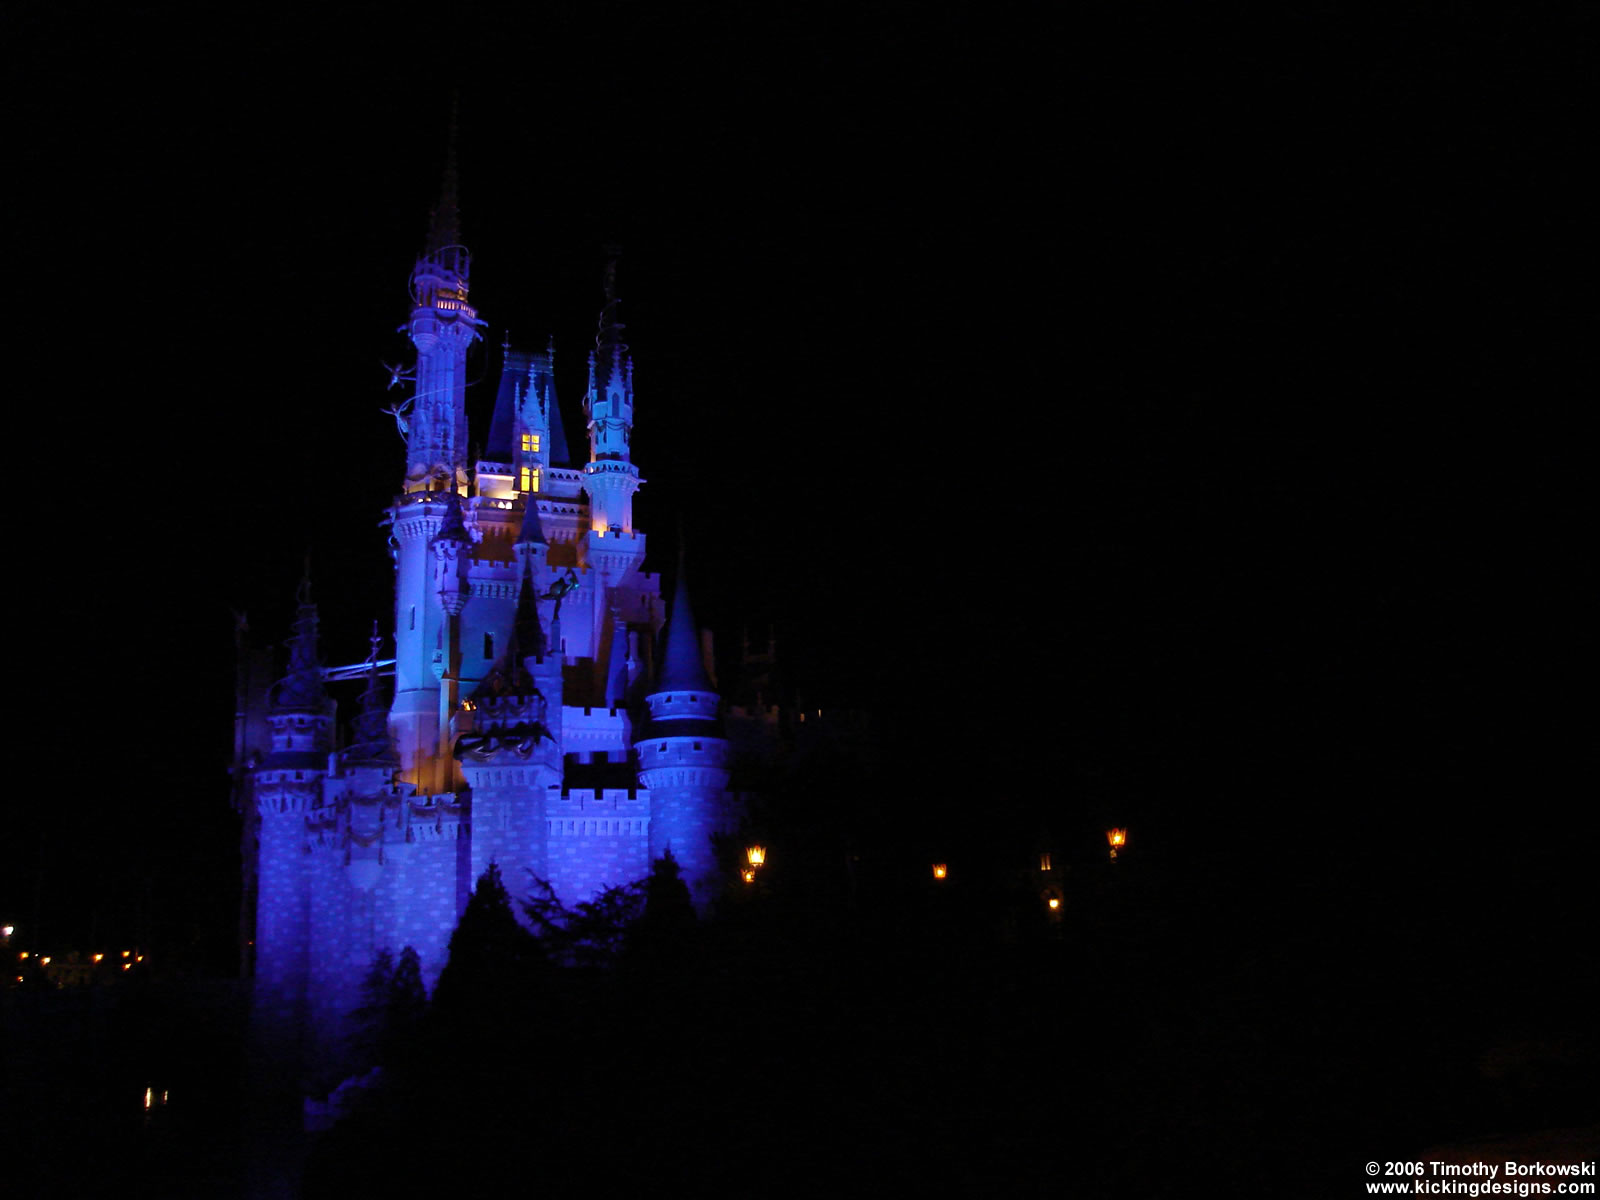 magic kingdom 04 magic kingdom 03 magic kingdom 02 magic kingdom 01 1600x1200